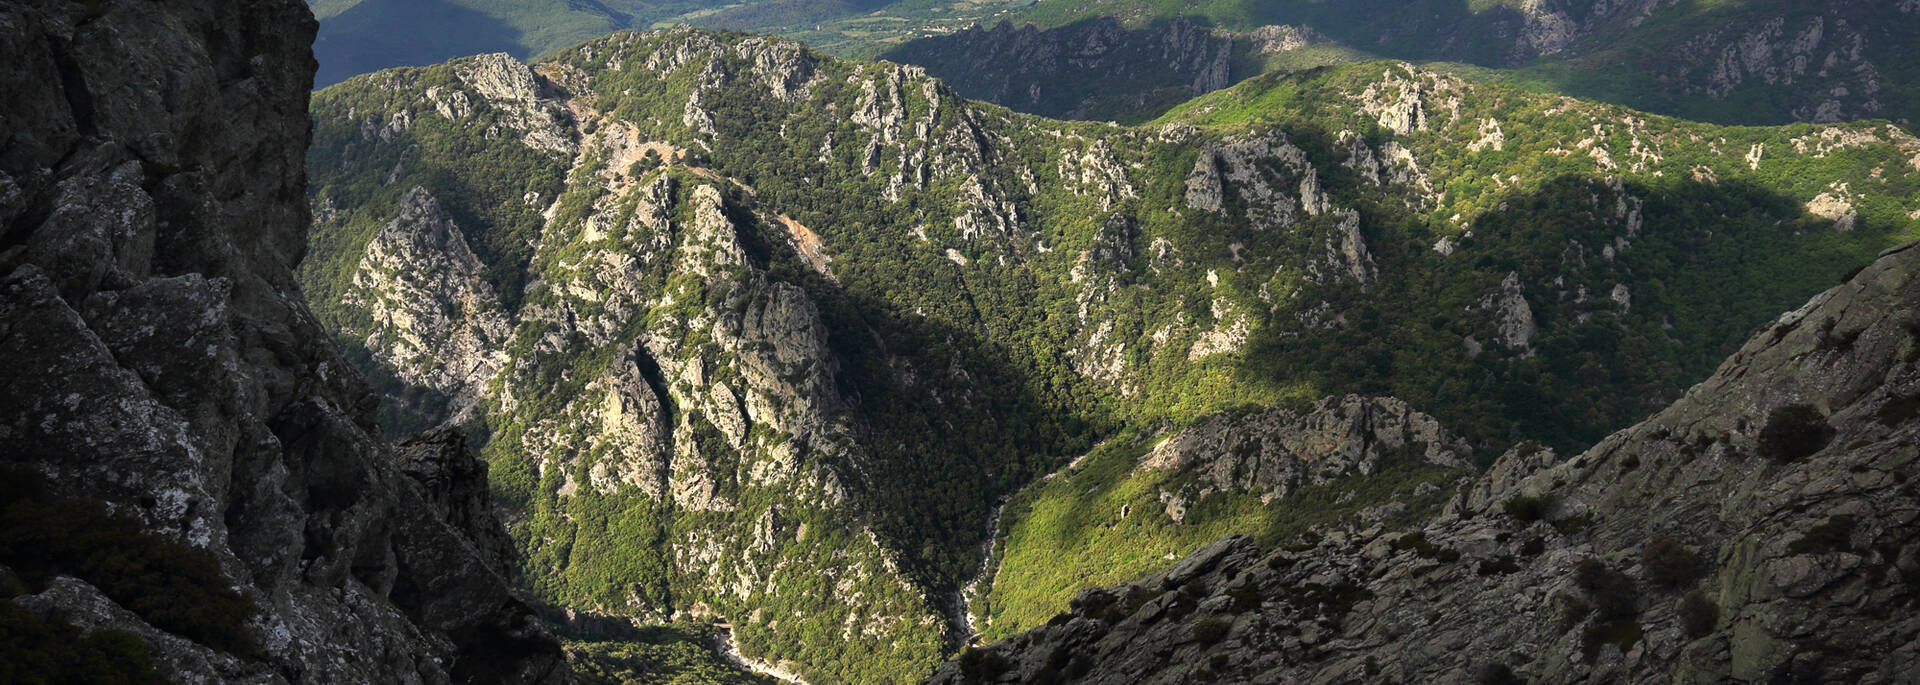 Dramatic limestone gorges in the Haut Languedoc et Vignobles